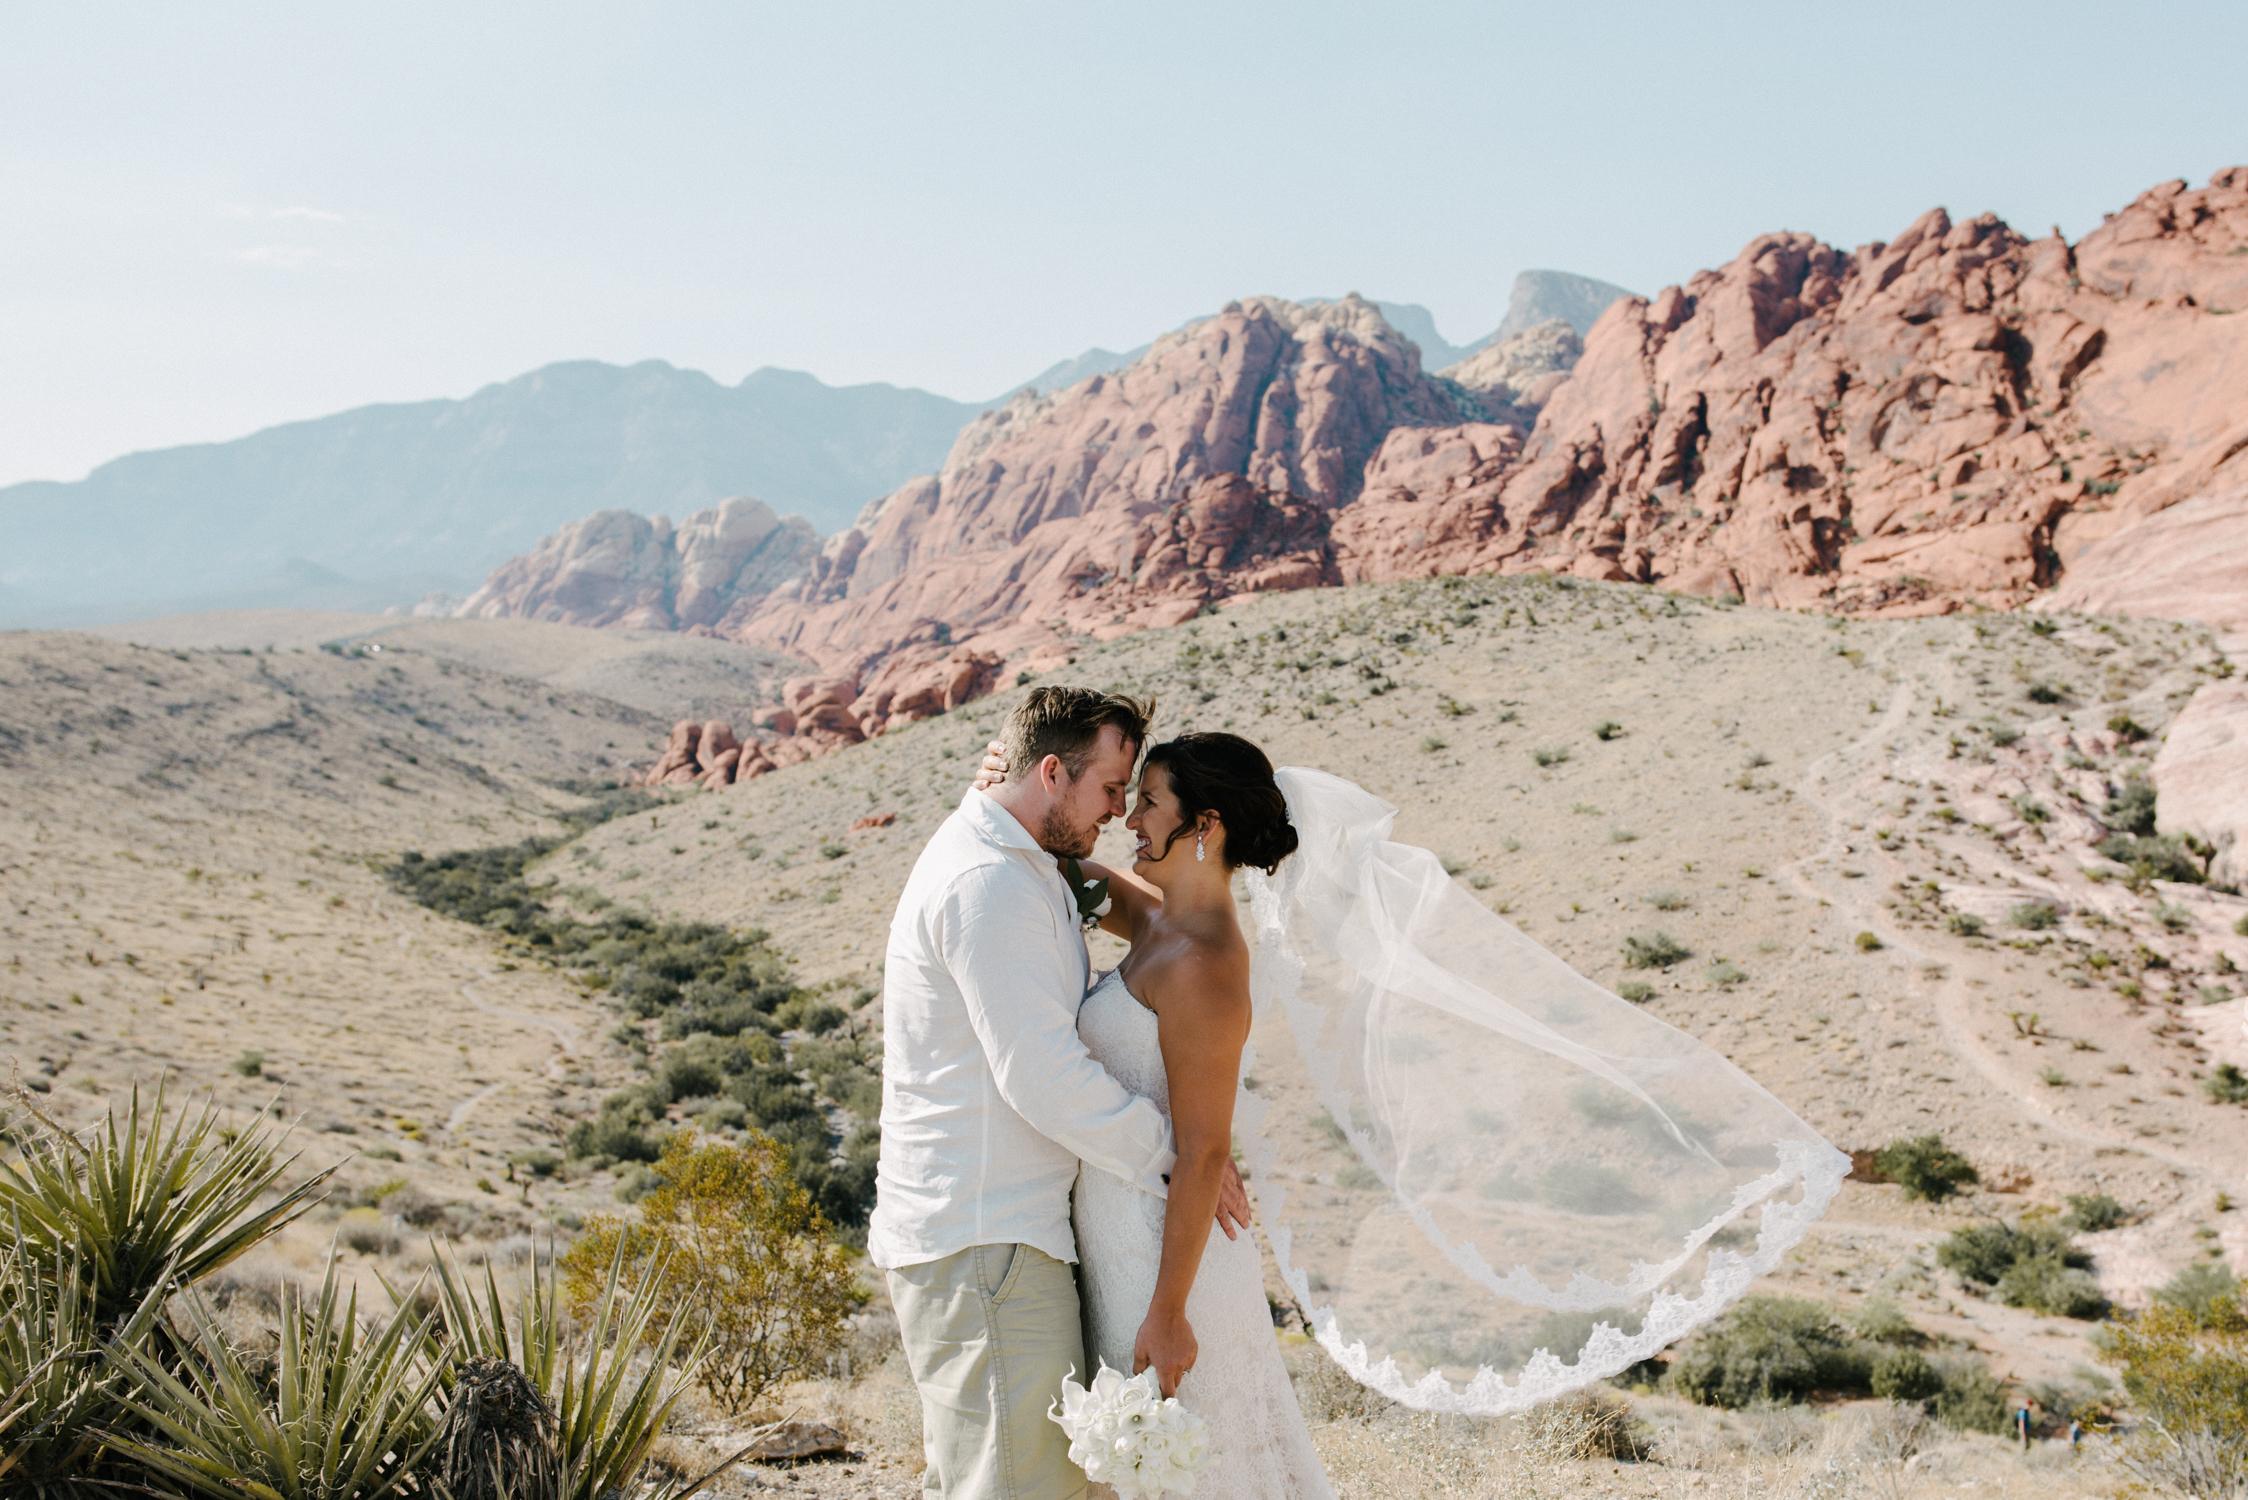 025_Redrock_canyon_vegas_wedding_photographer.jpg